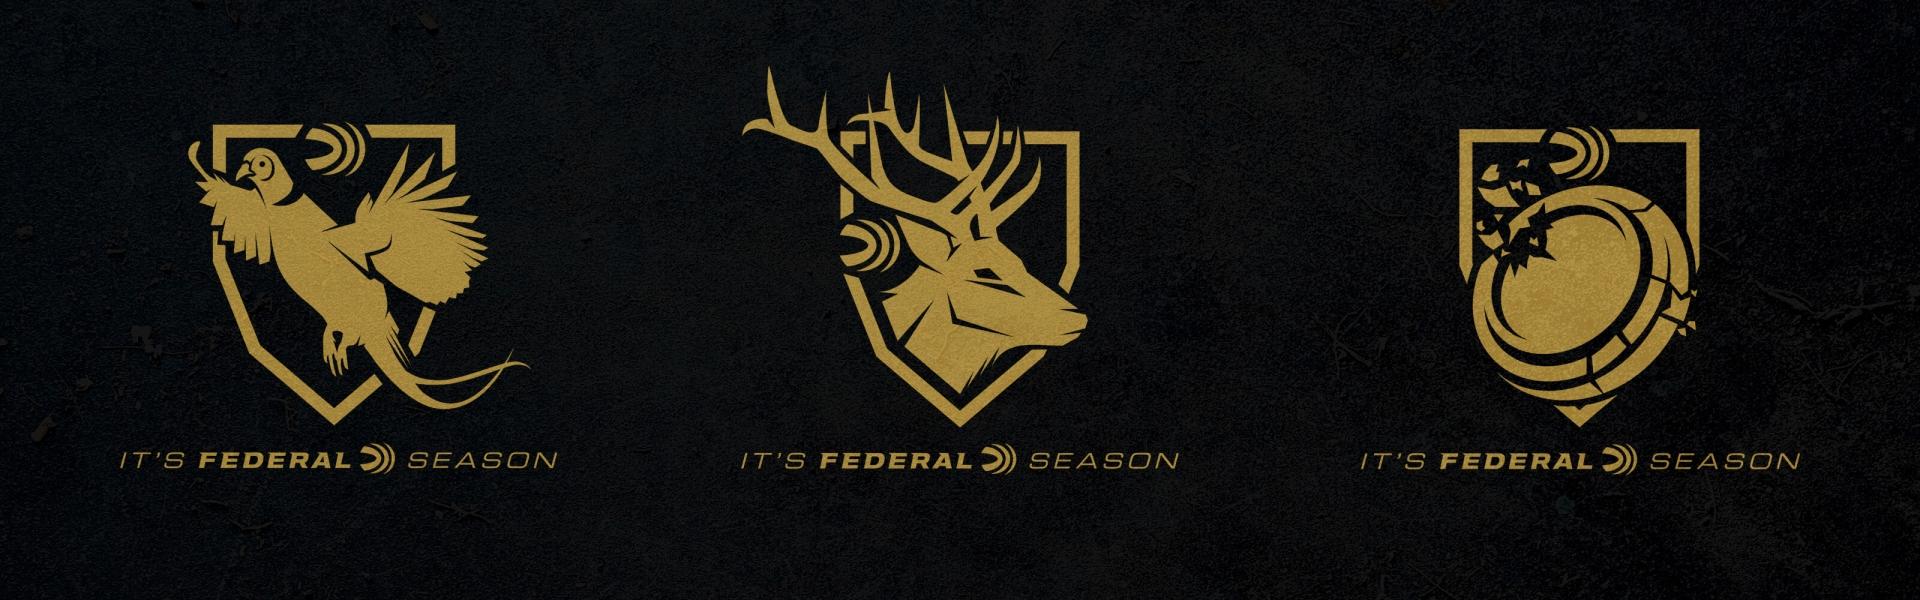 federal season graphics